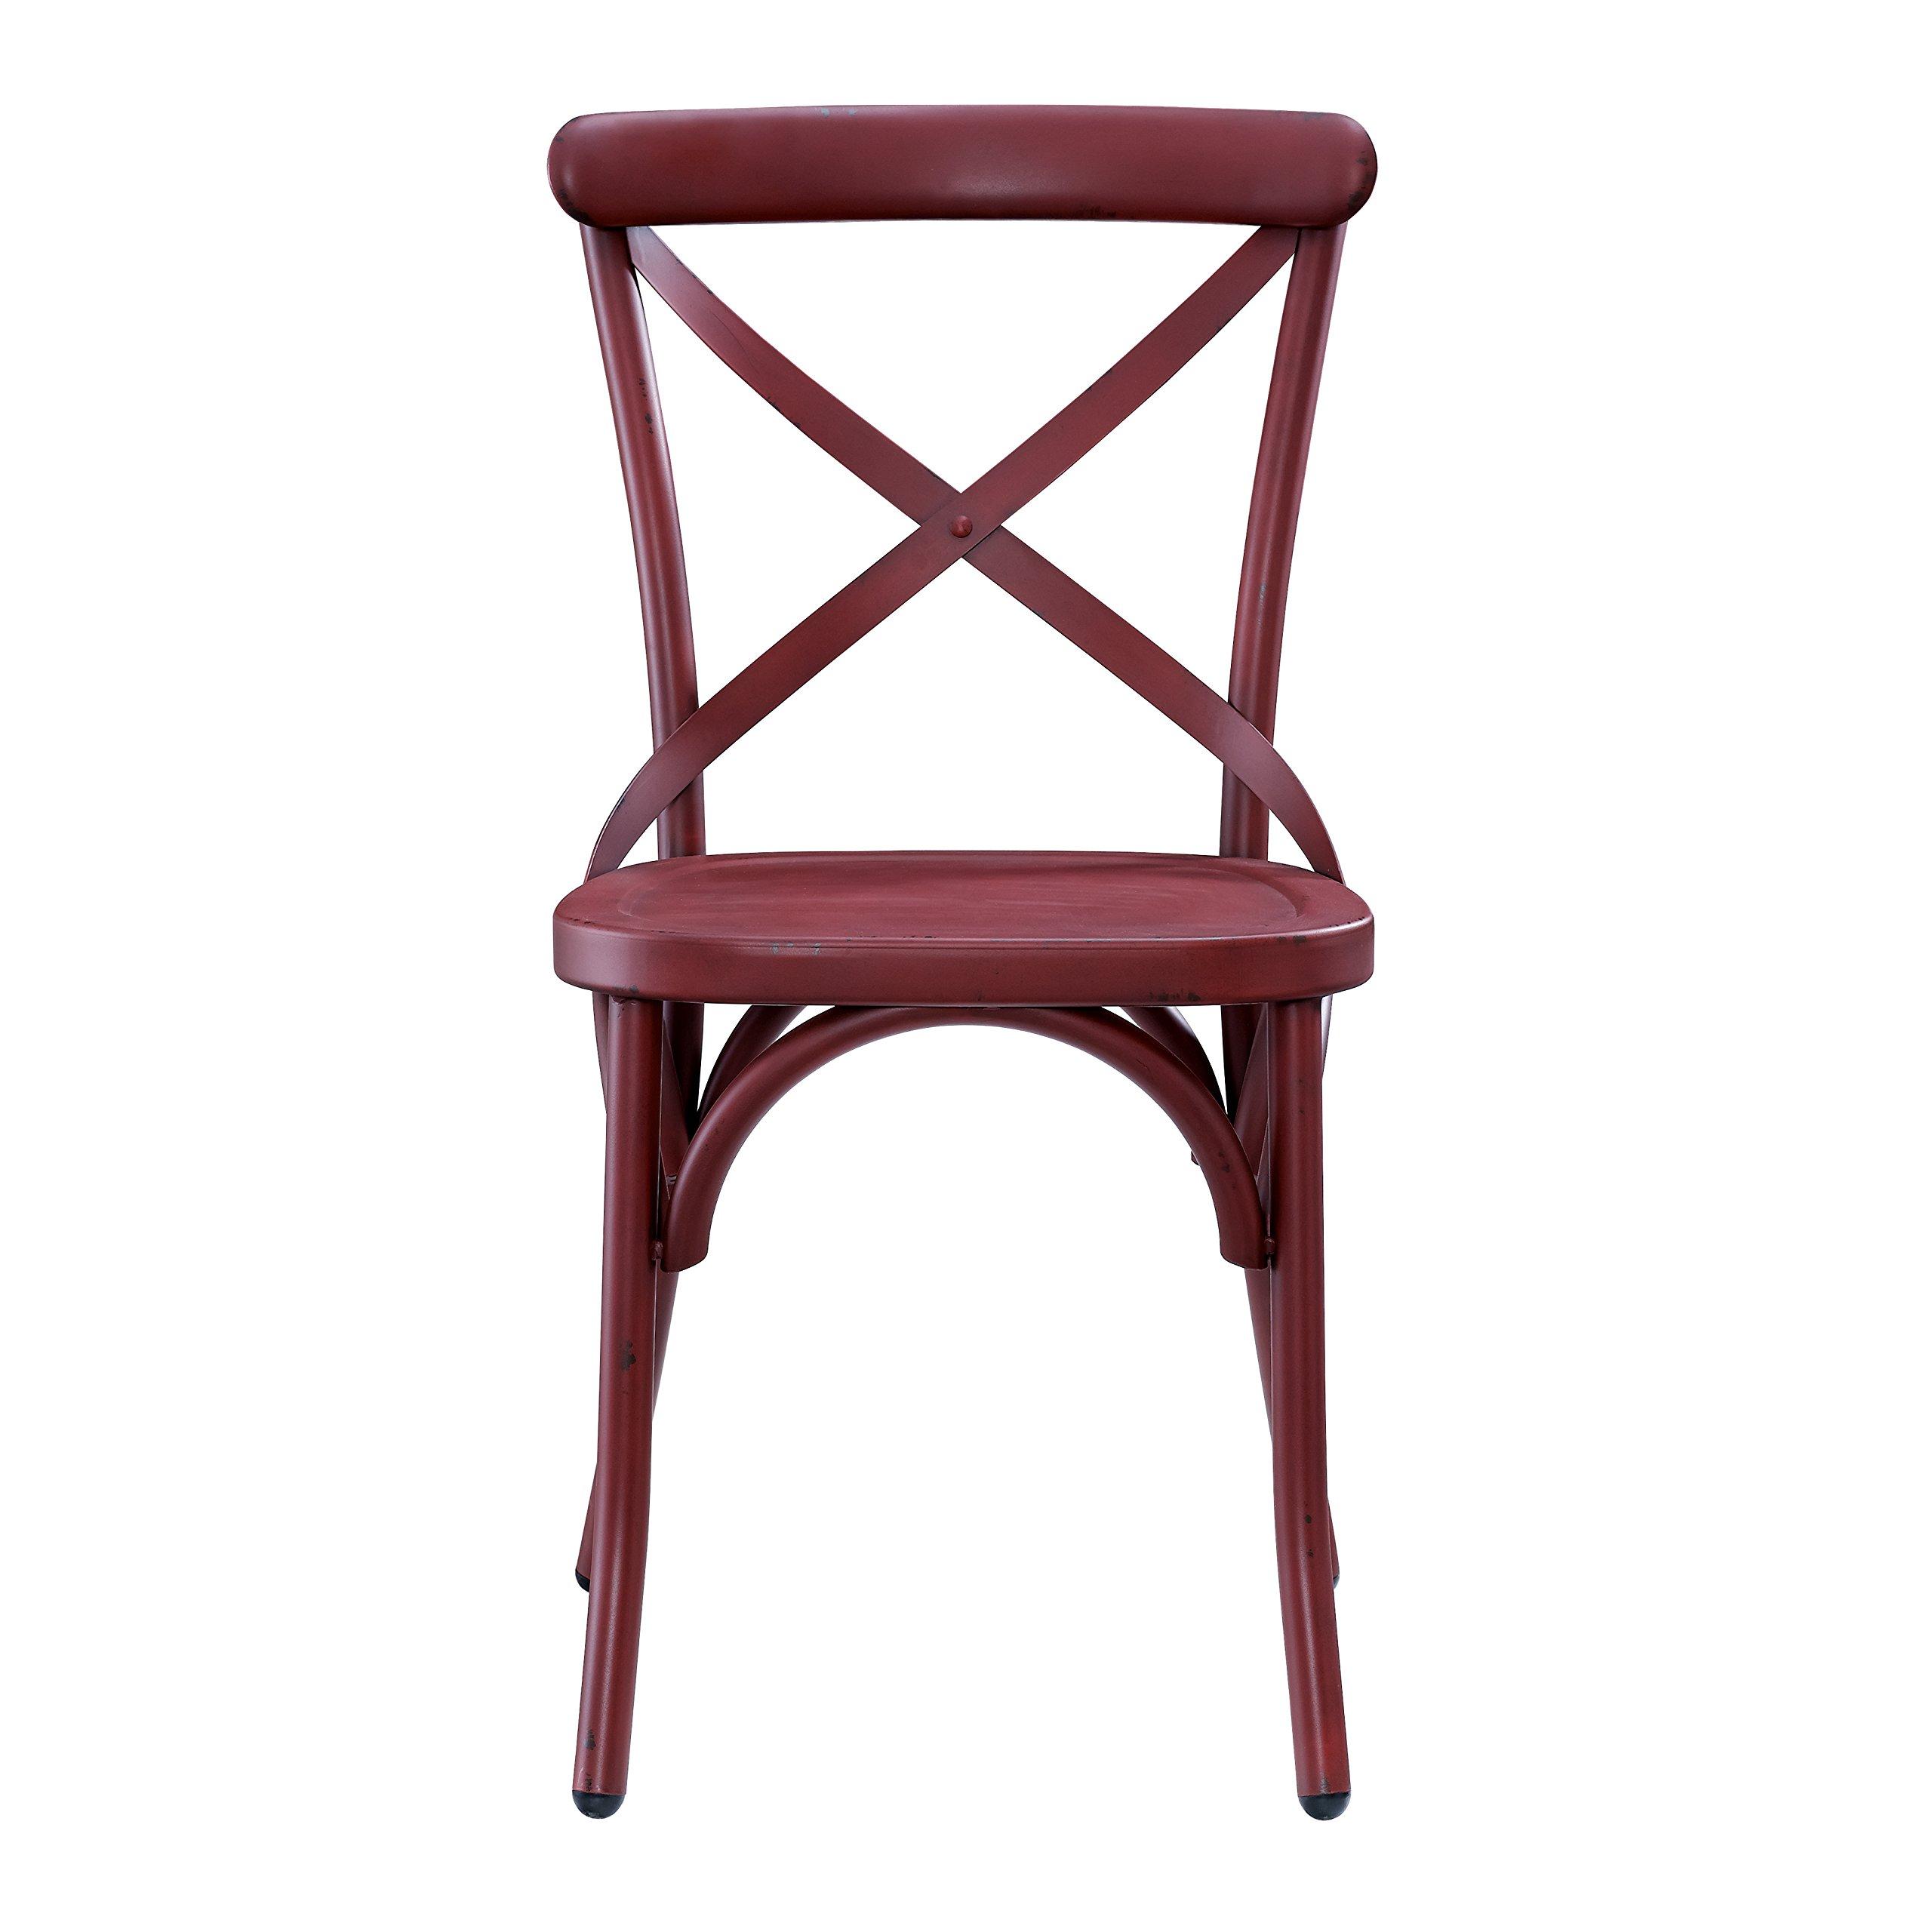 Pulaski DS-D069 Red Metal Dining (2/ctn) Chair, Brick